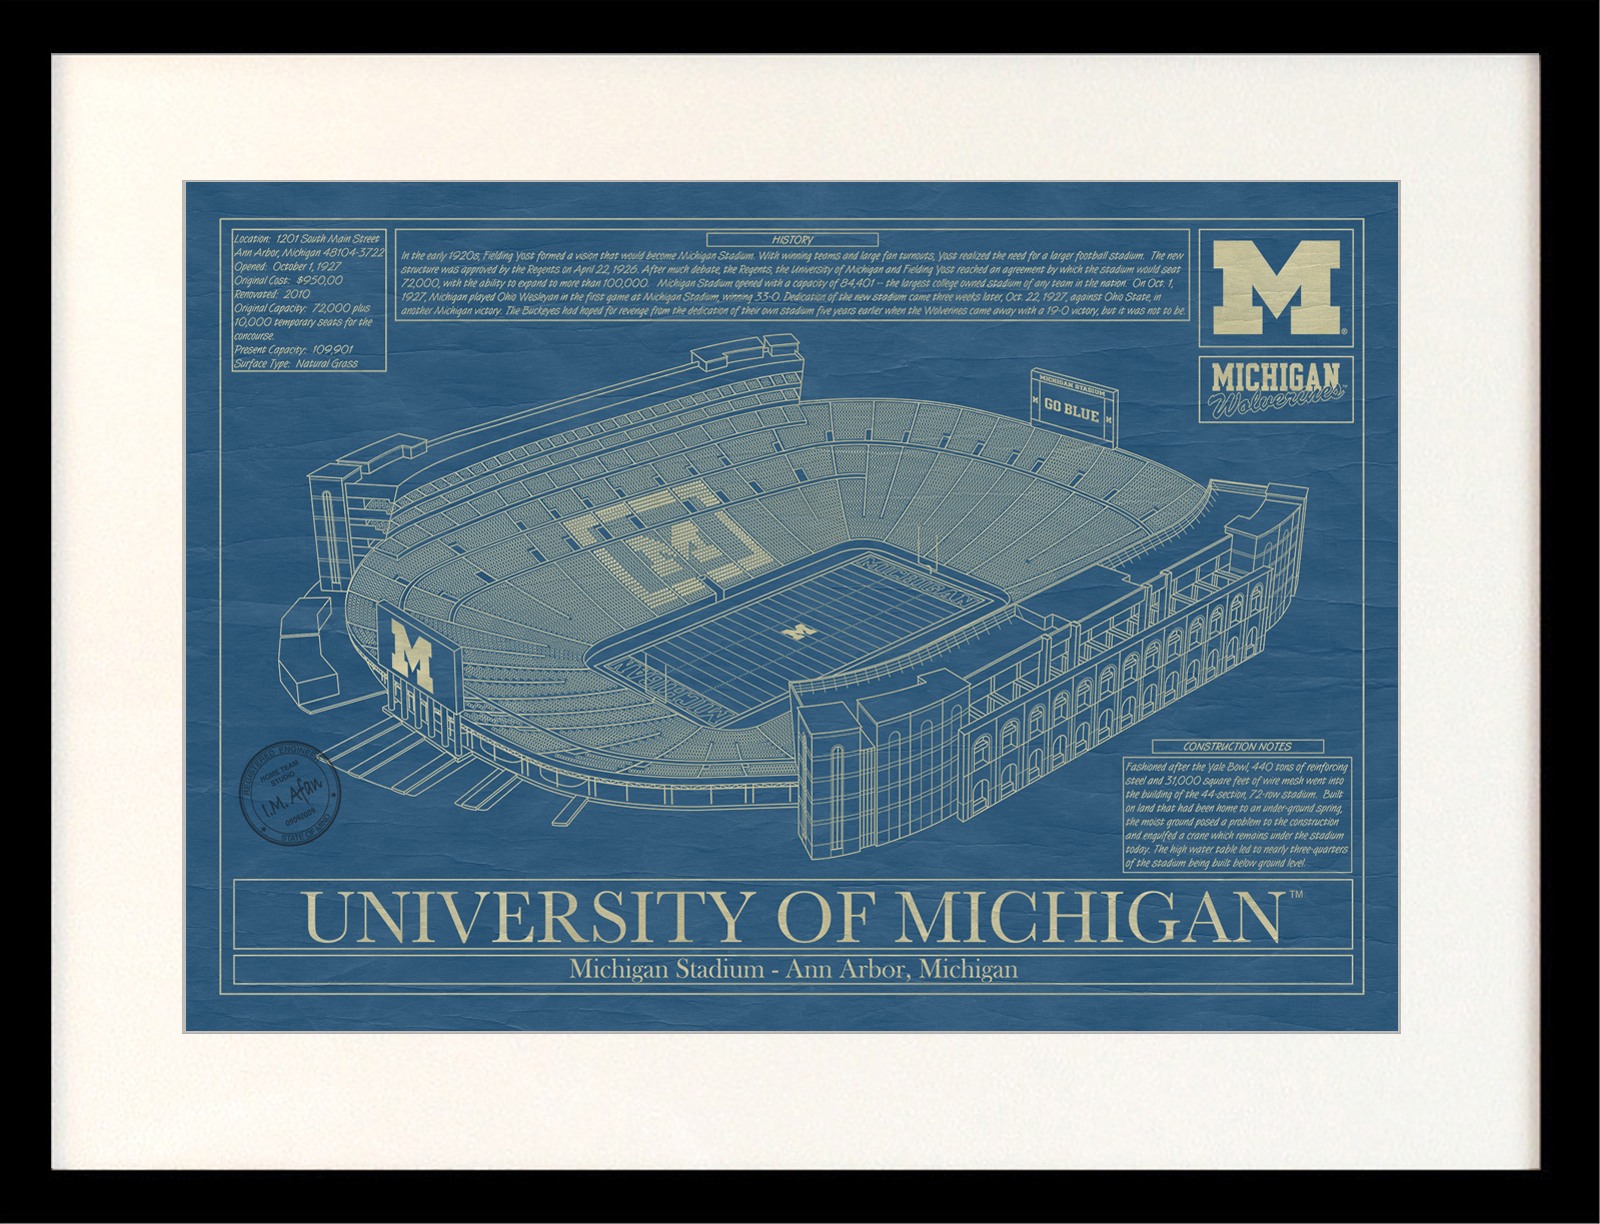 Michigan michigan stadium blueprint art stadium blueprint company click malvernweather Image collections